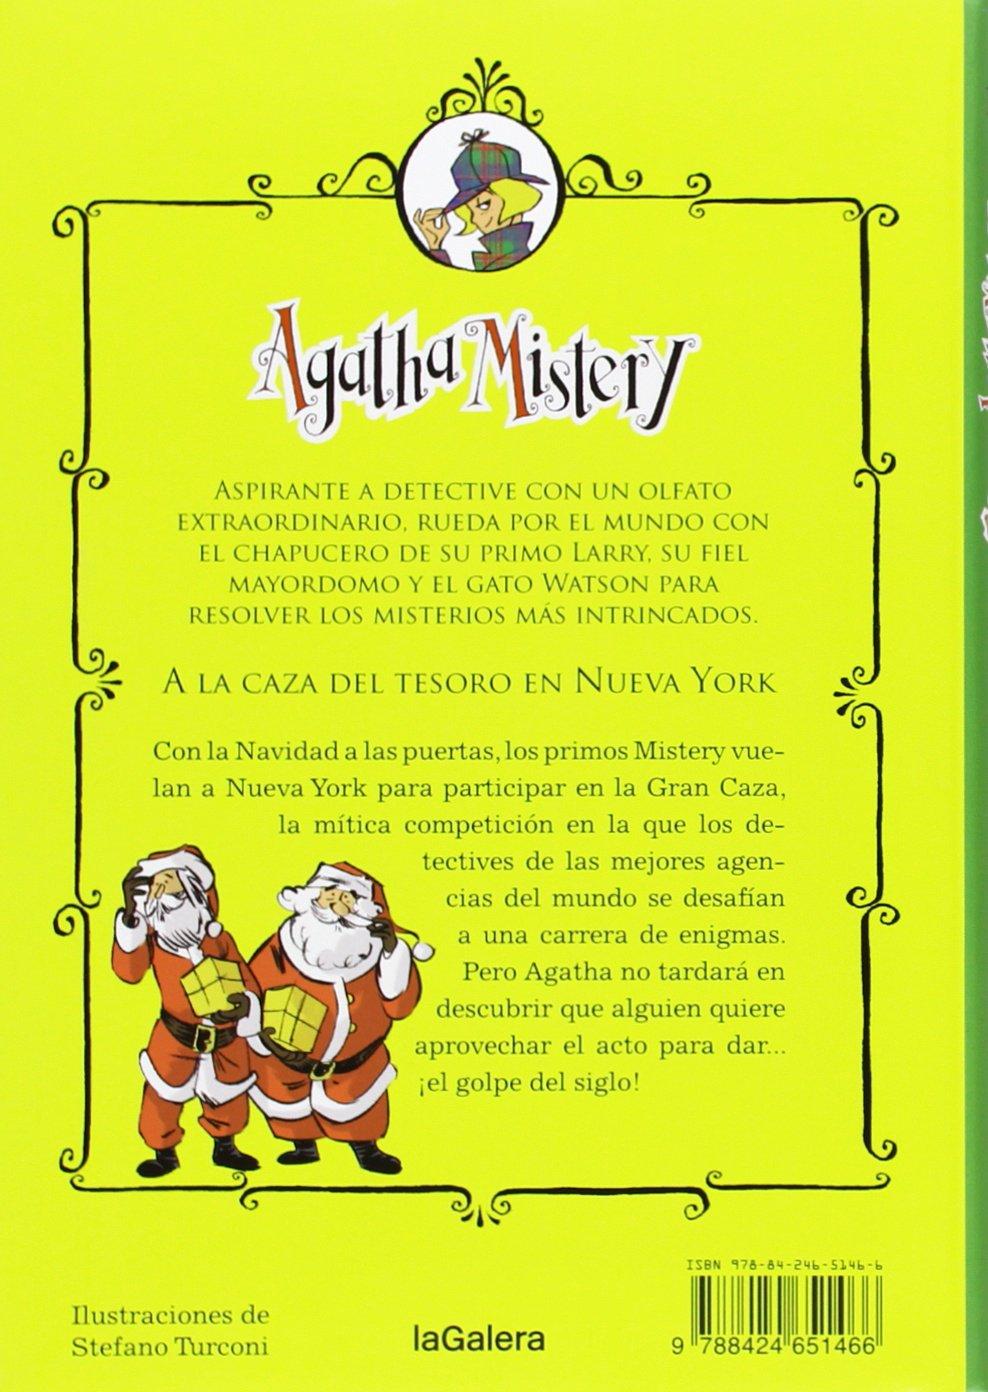 Agatha Mistery: A la caza del tesoro en Nueva York # 14 (Spanish Edition): Sir Steve Stevenson, La Galera, Stefano Turconi: 9788424651466: Amazon.com: Books